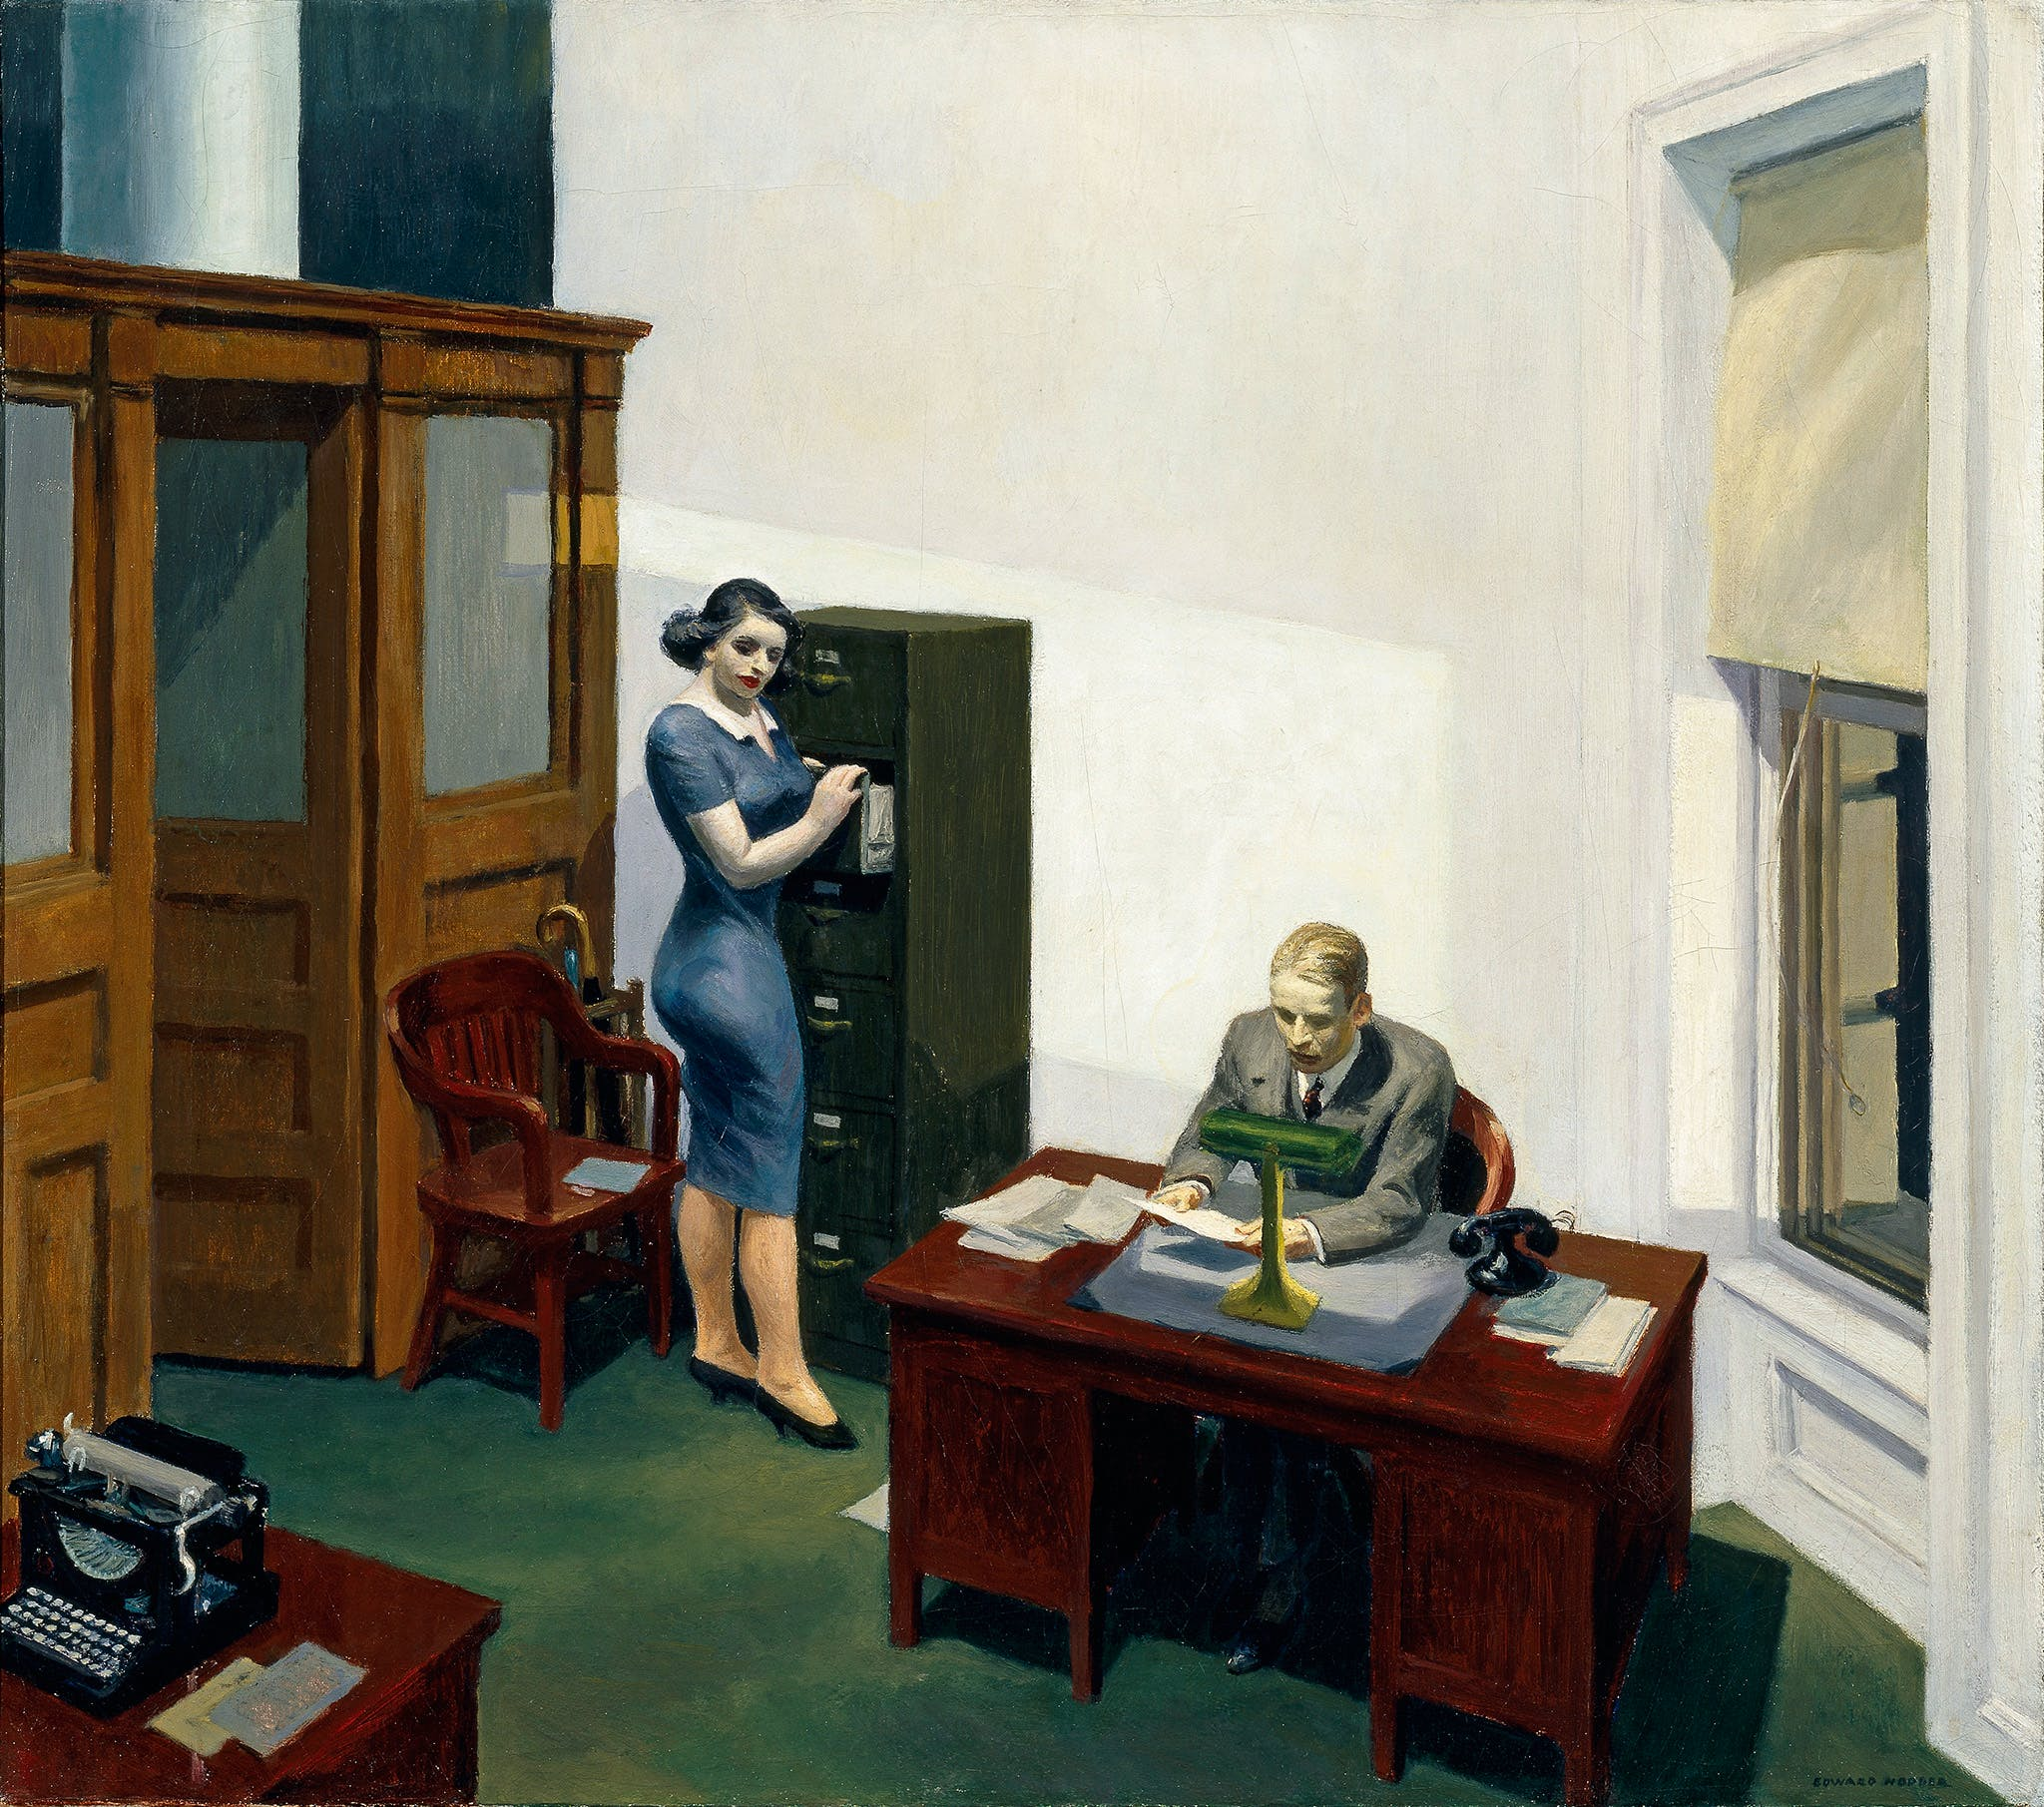 Edward Hopper, Office at Night, 1940